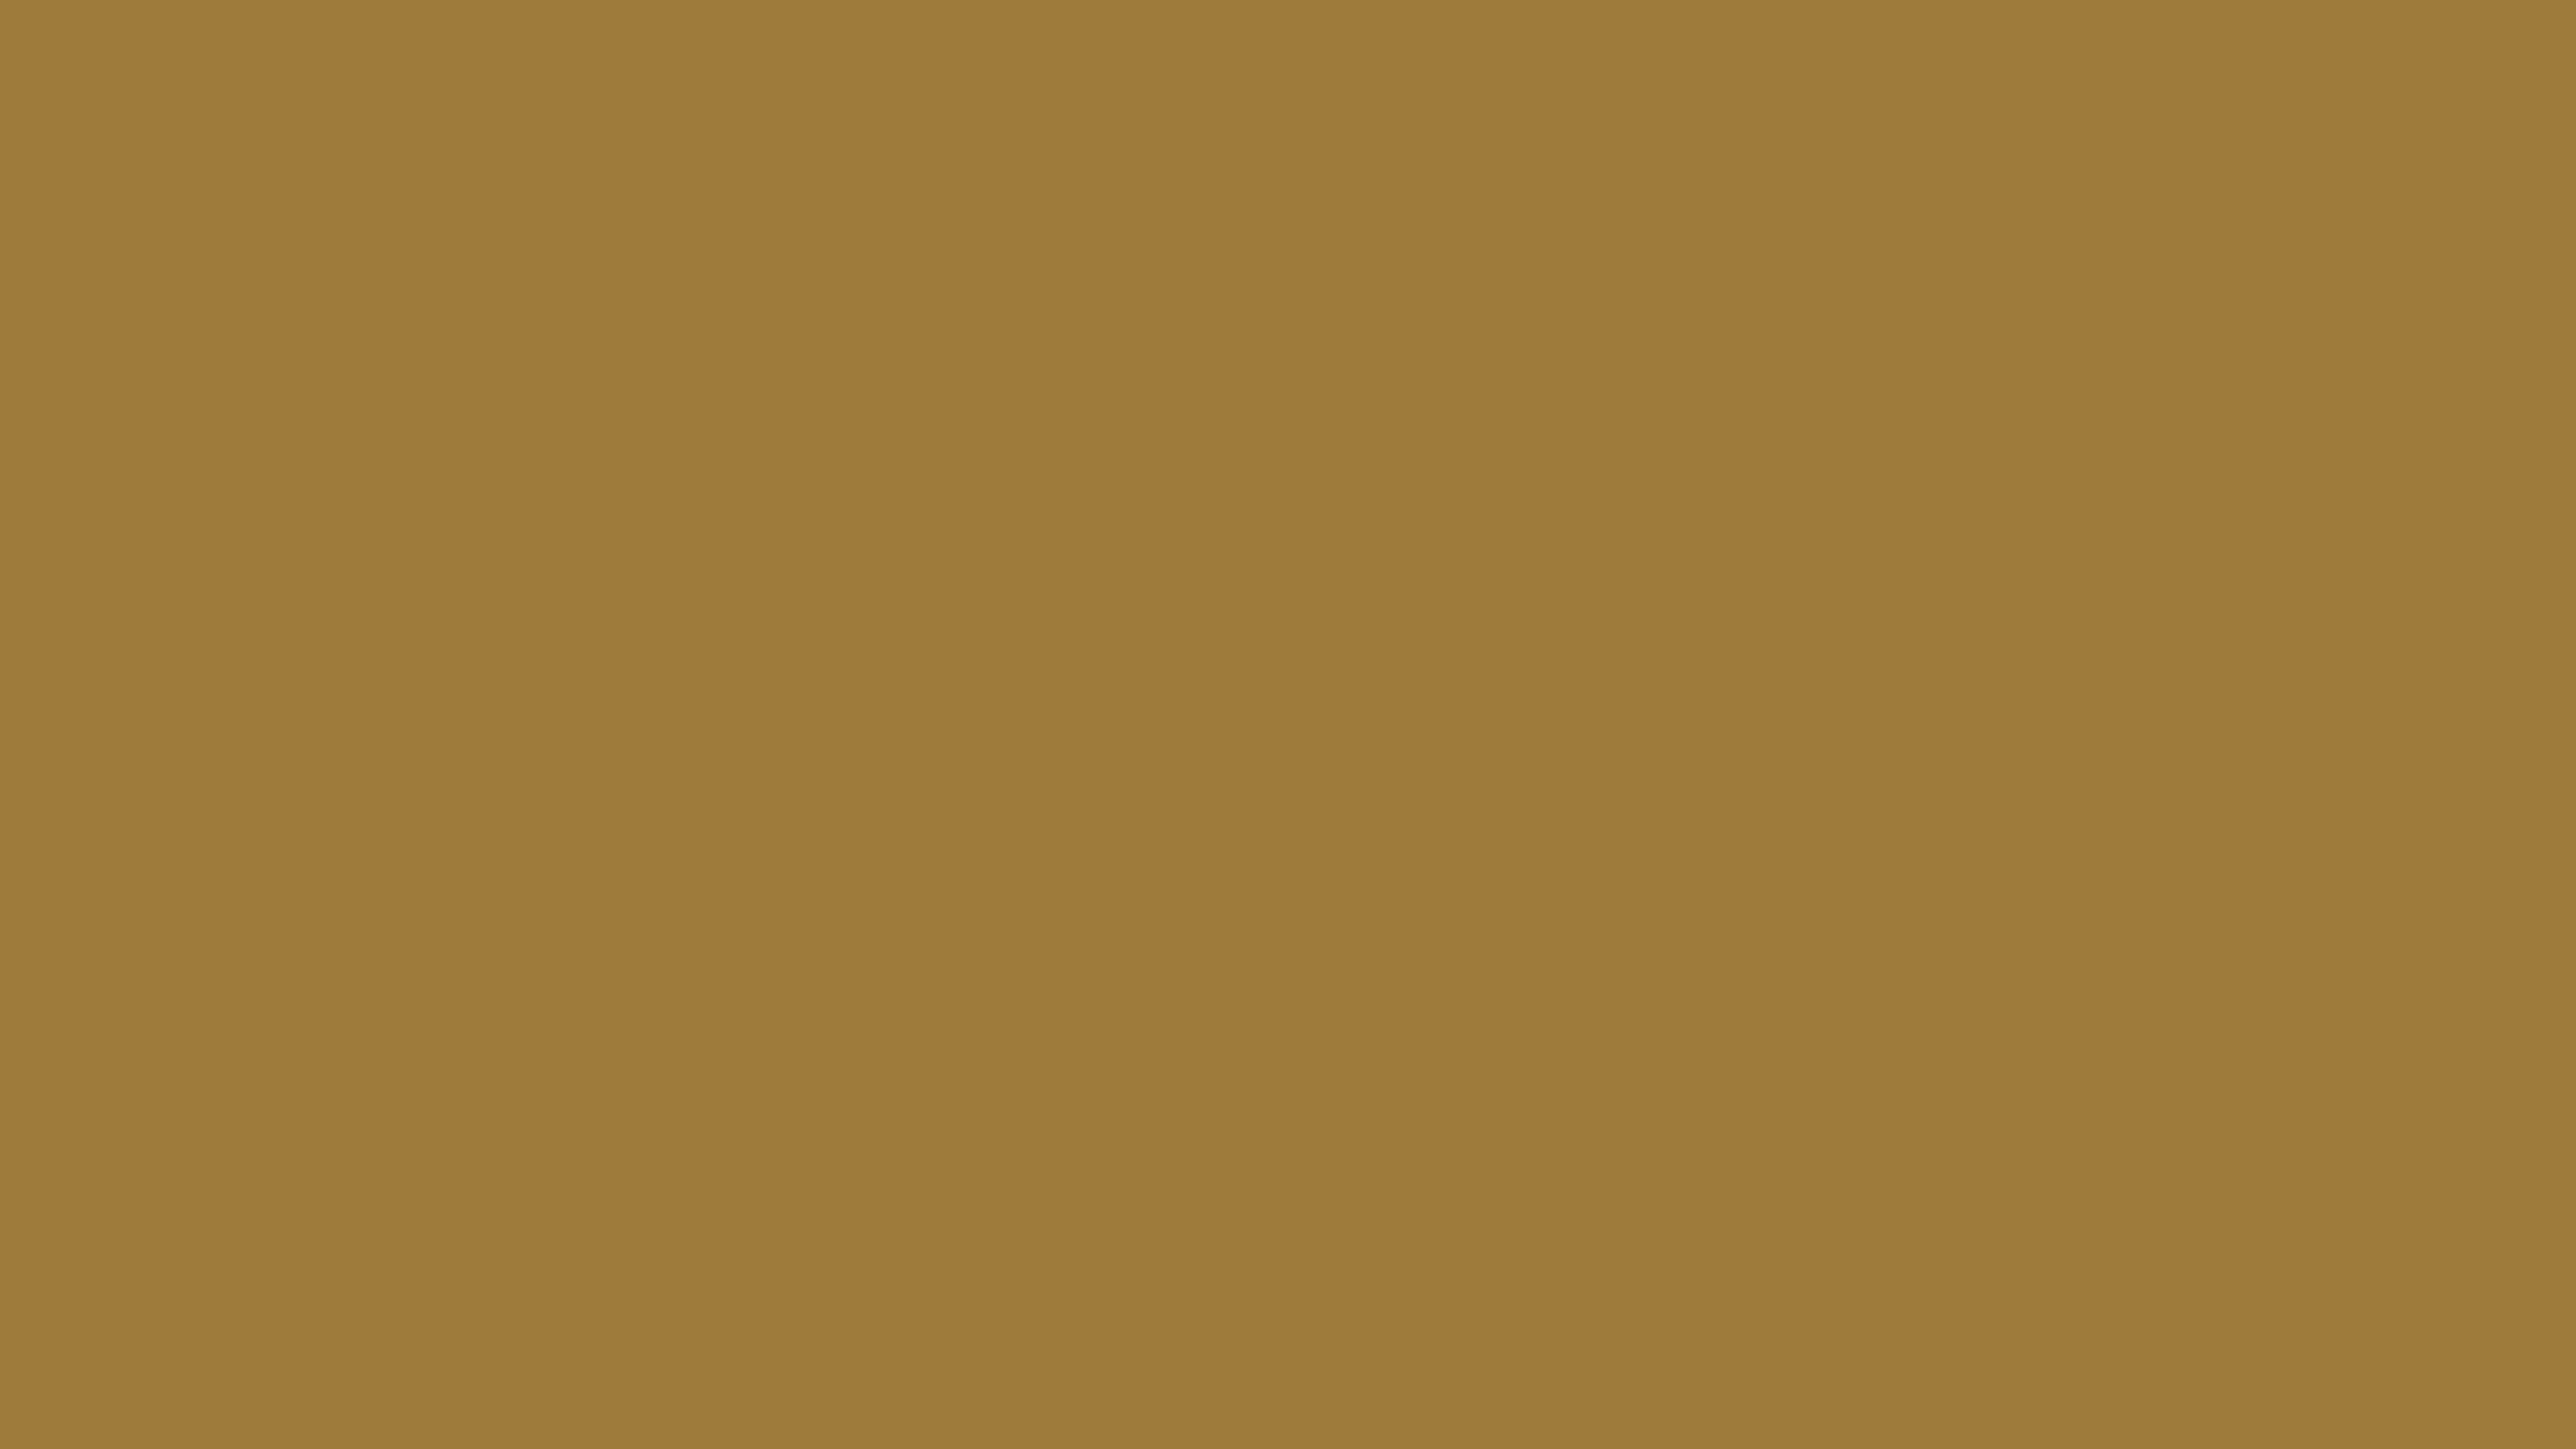 3840x2160 Metallic Sunburst Solid Color Background